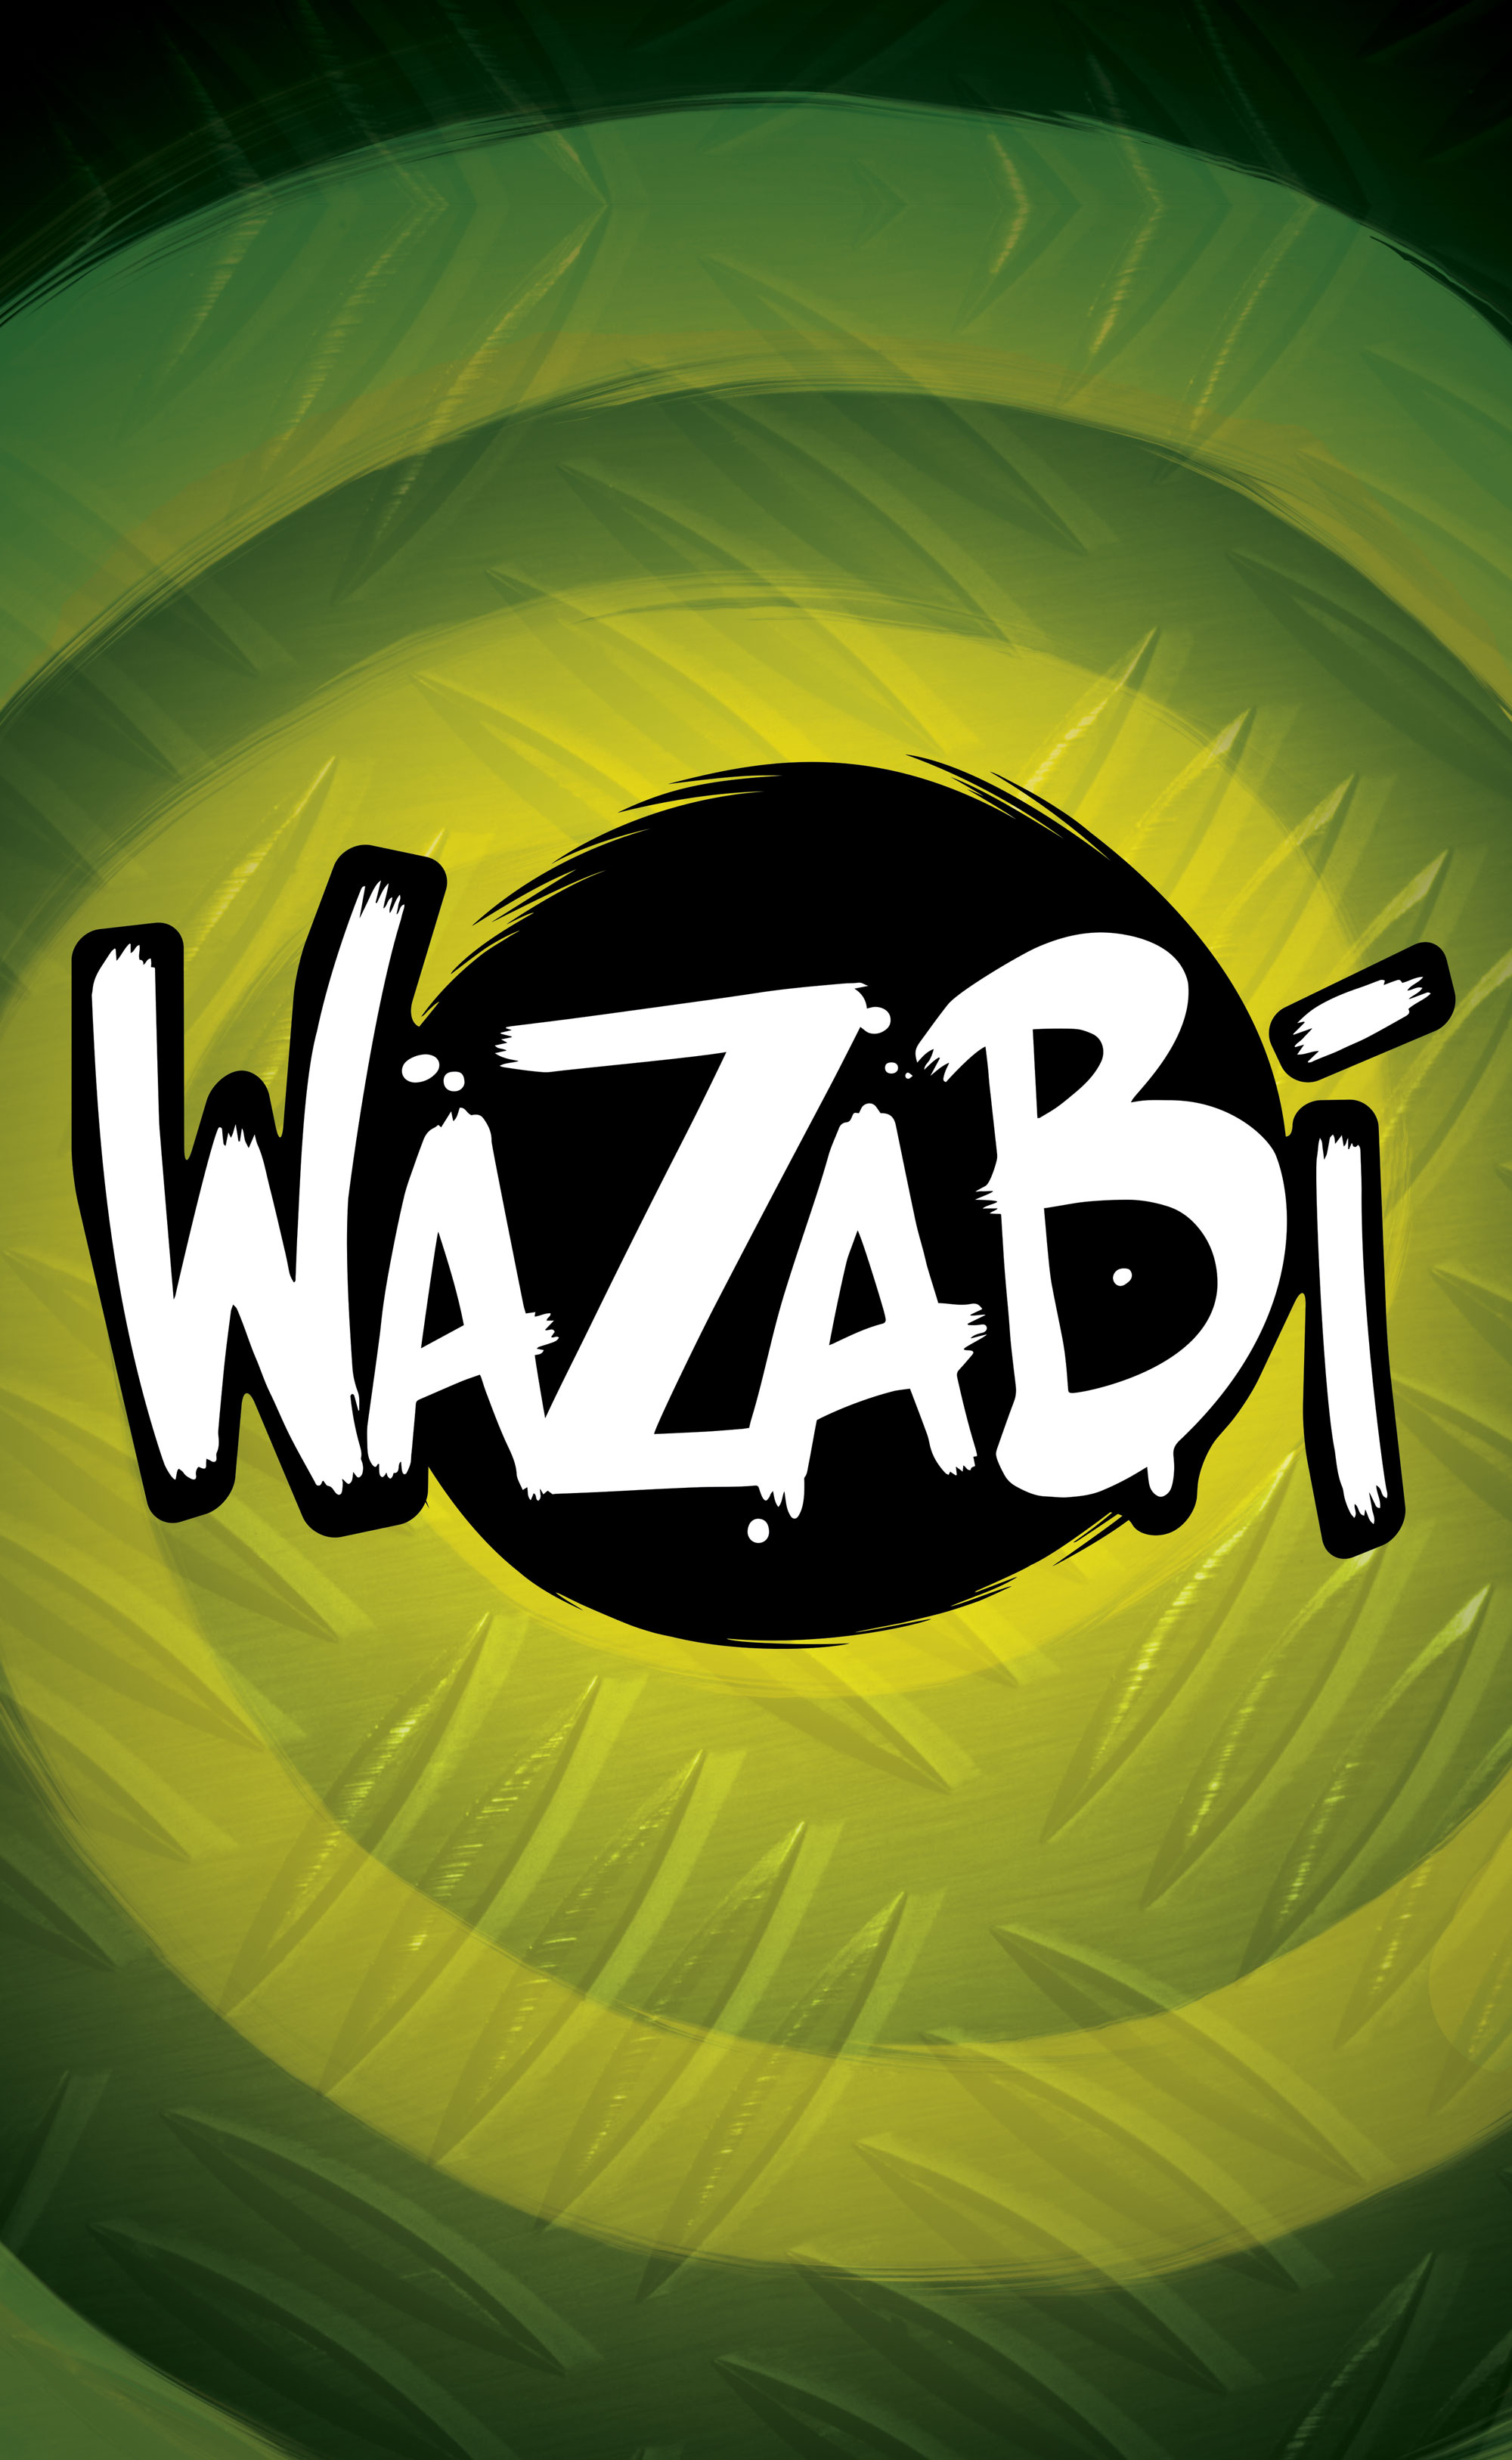 Verso de carte wazabi